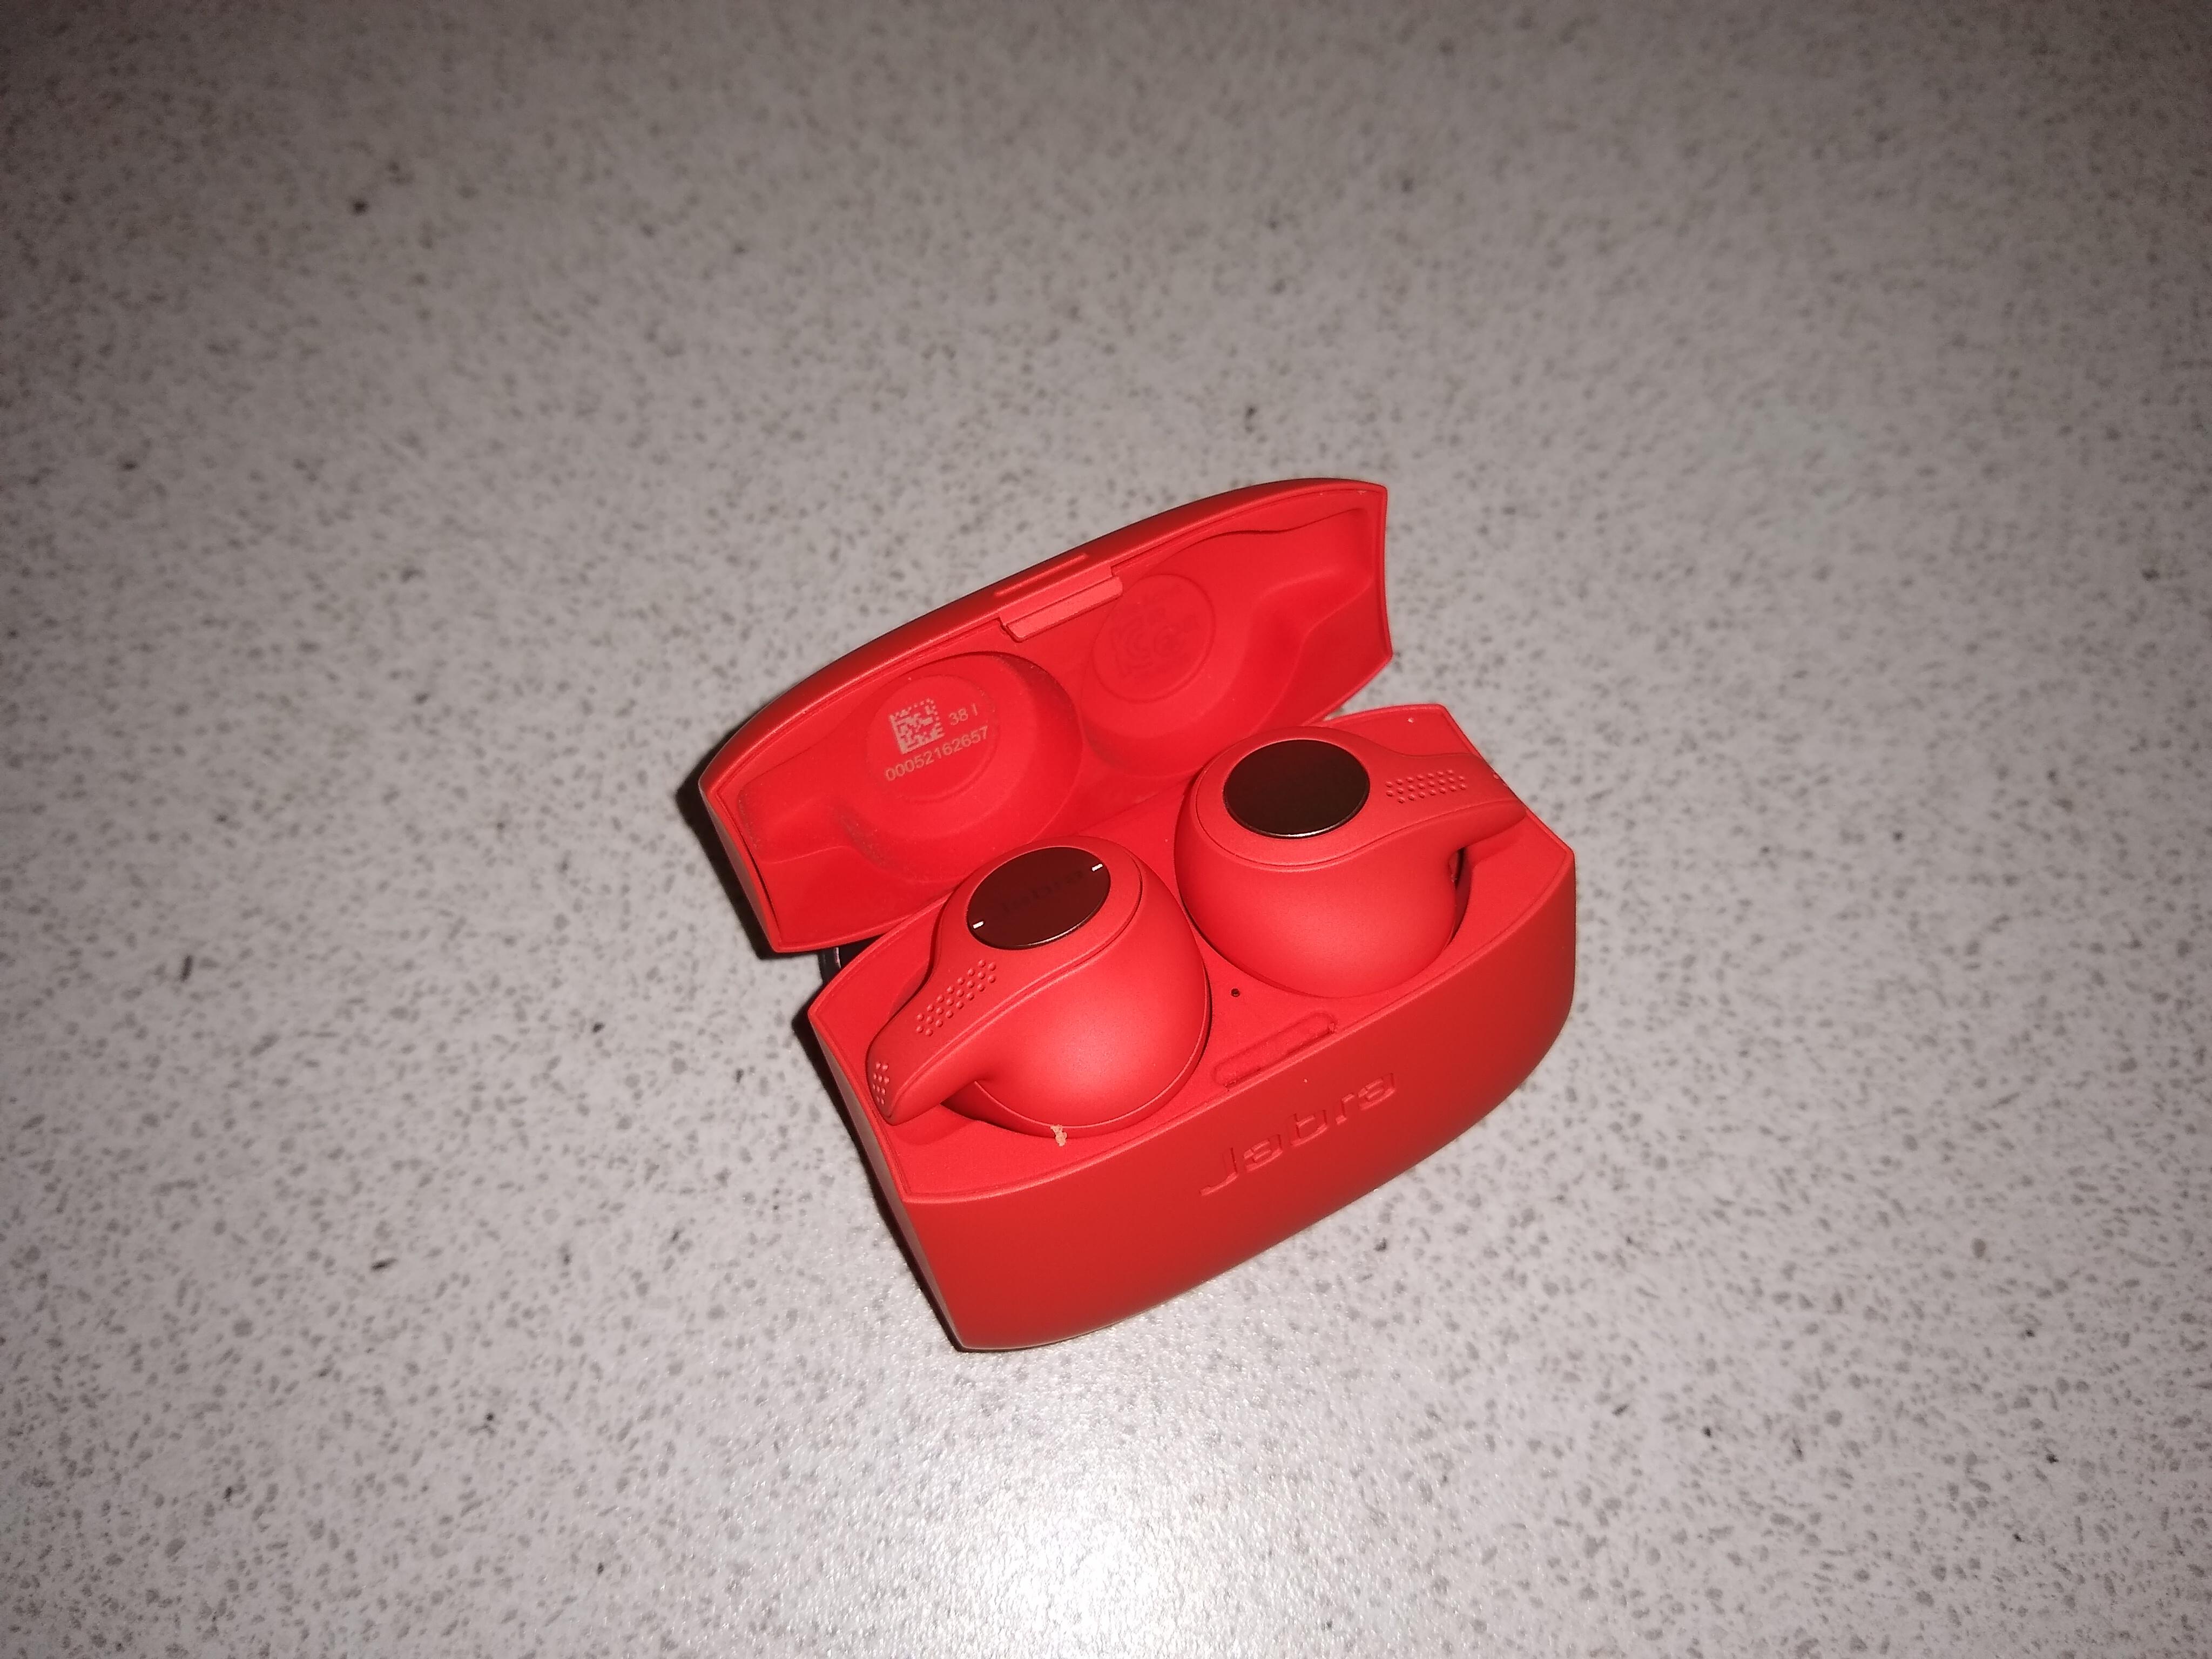 First Look The Jabra Elite Active 65t In Copper Red Jabraelite65t Tech Jabra Techbuzzireland